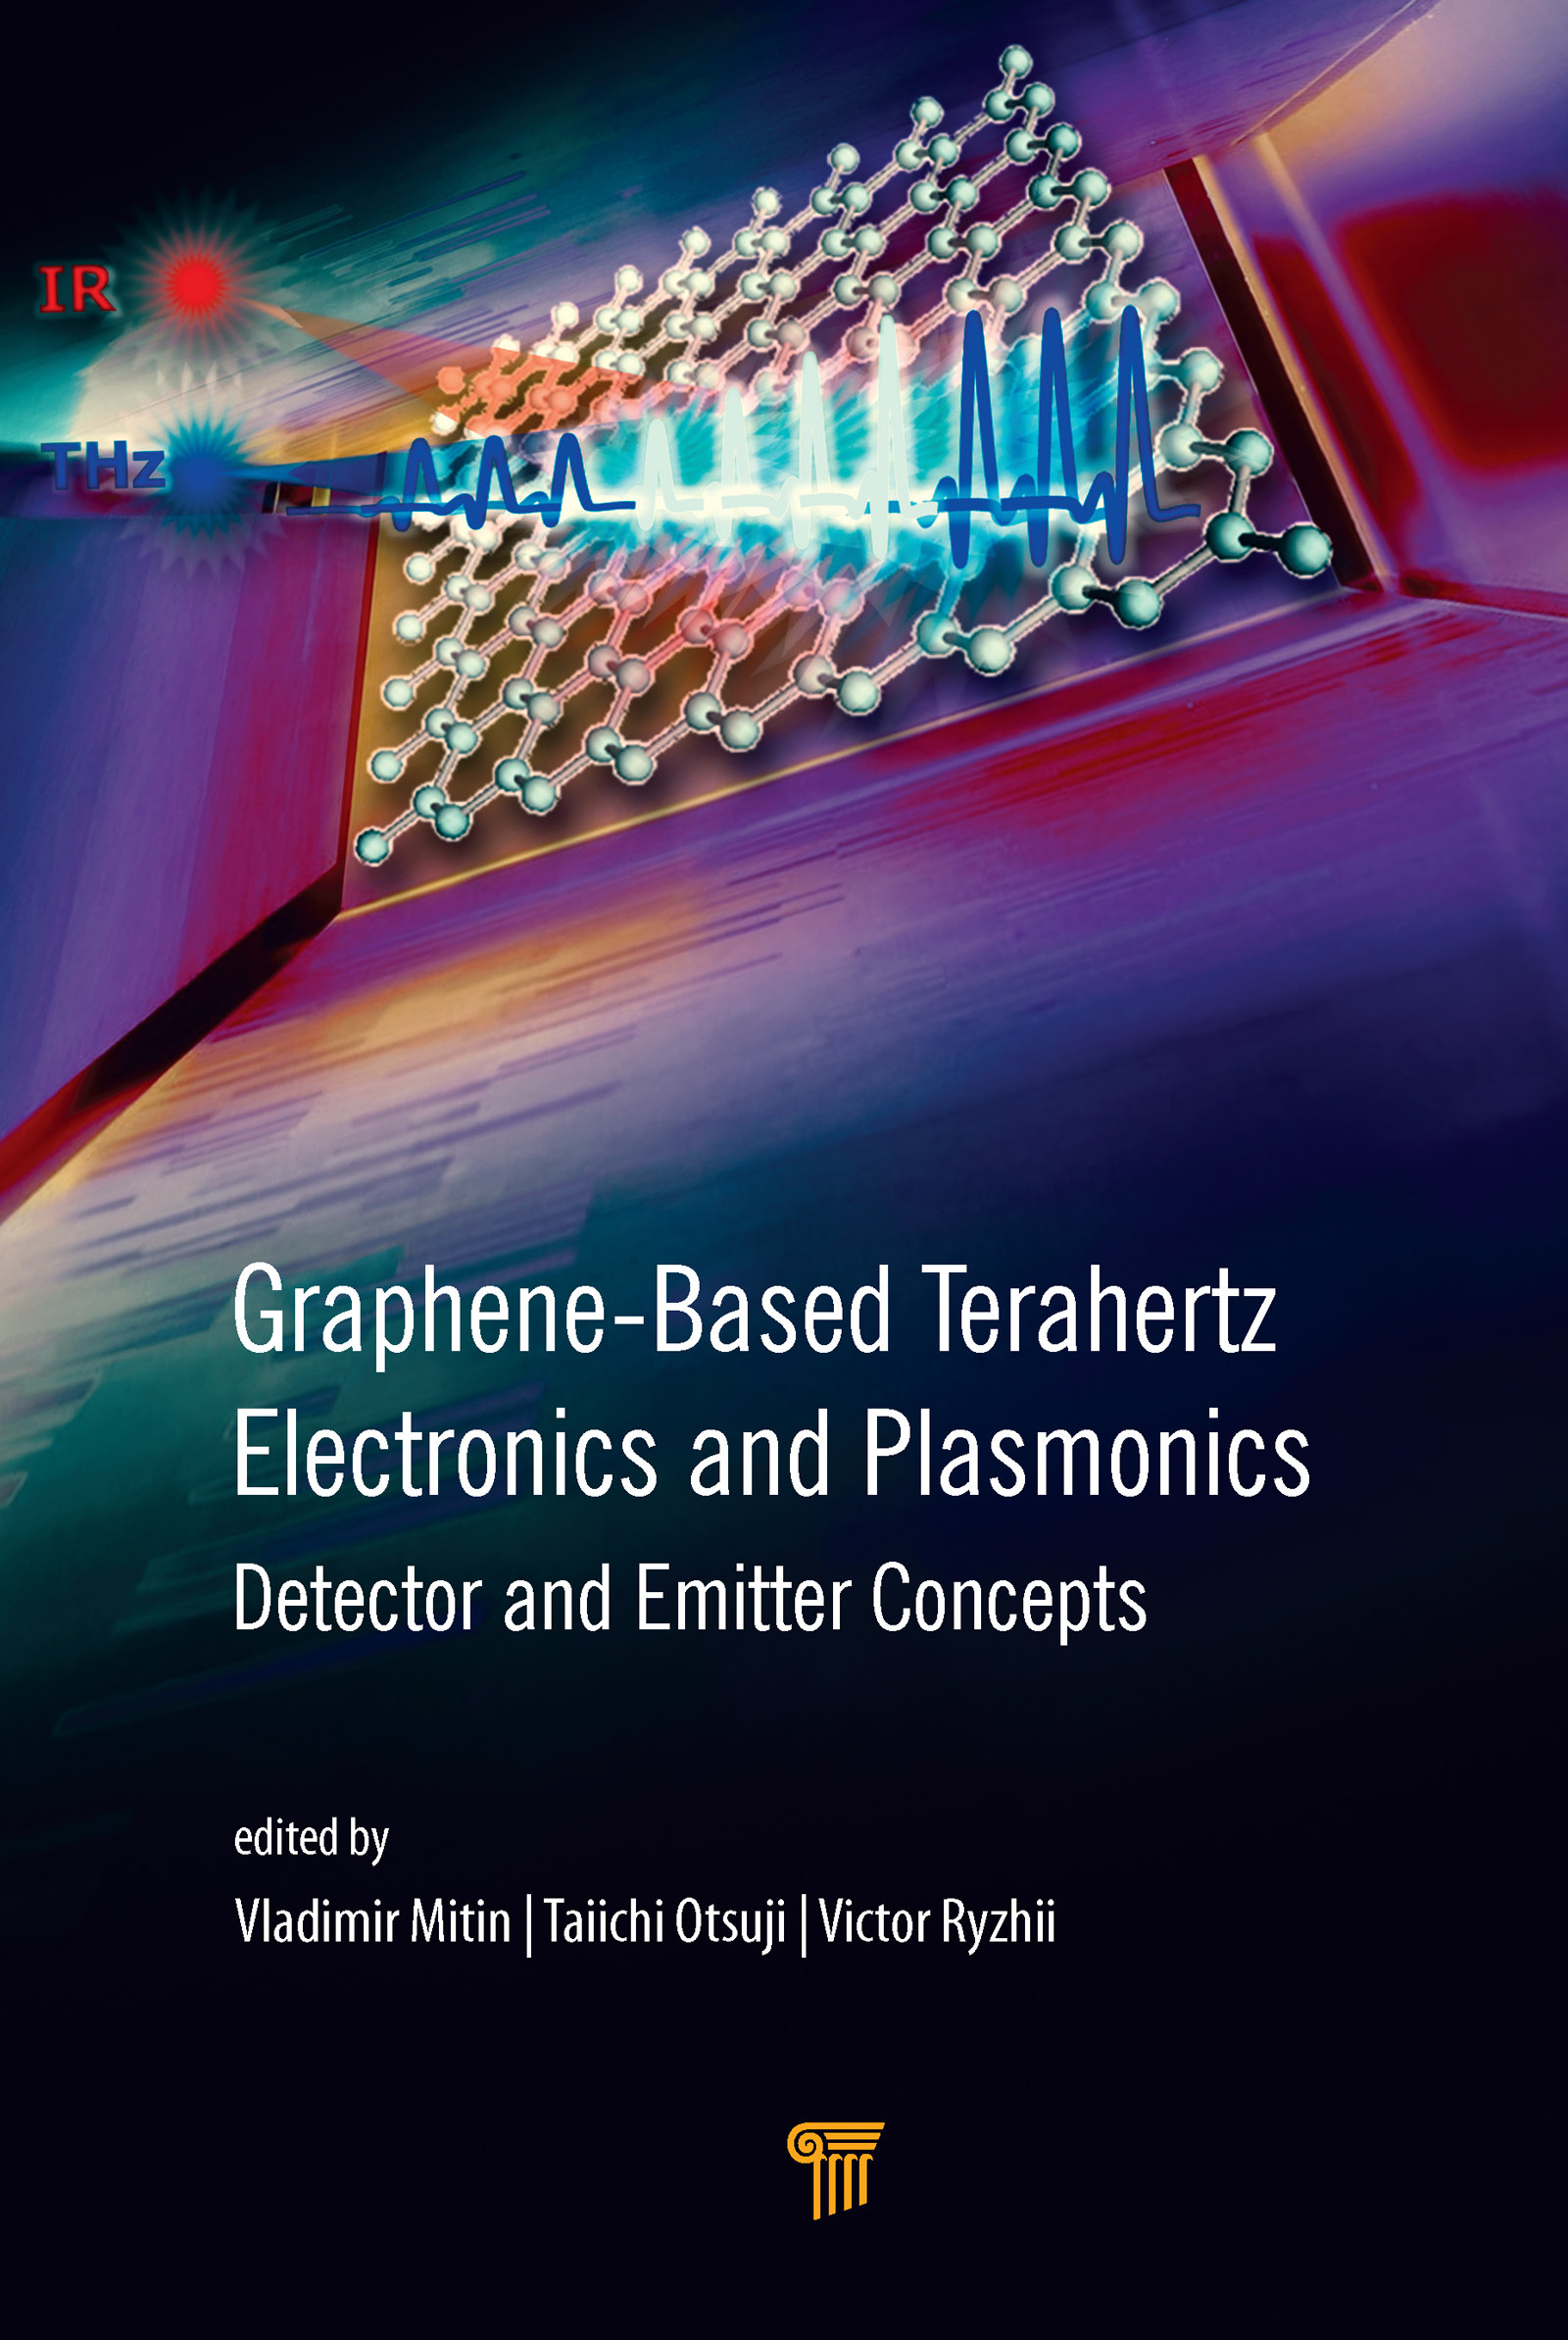 Toward the Creation of Terahertz Graphene Injection Laser                            *